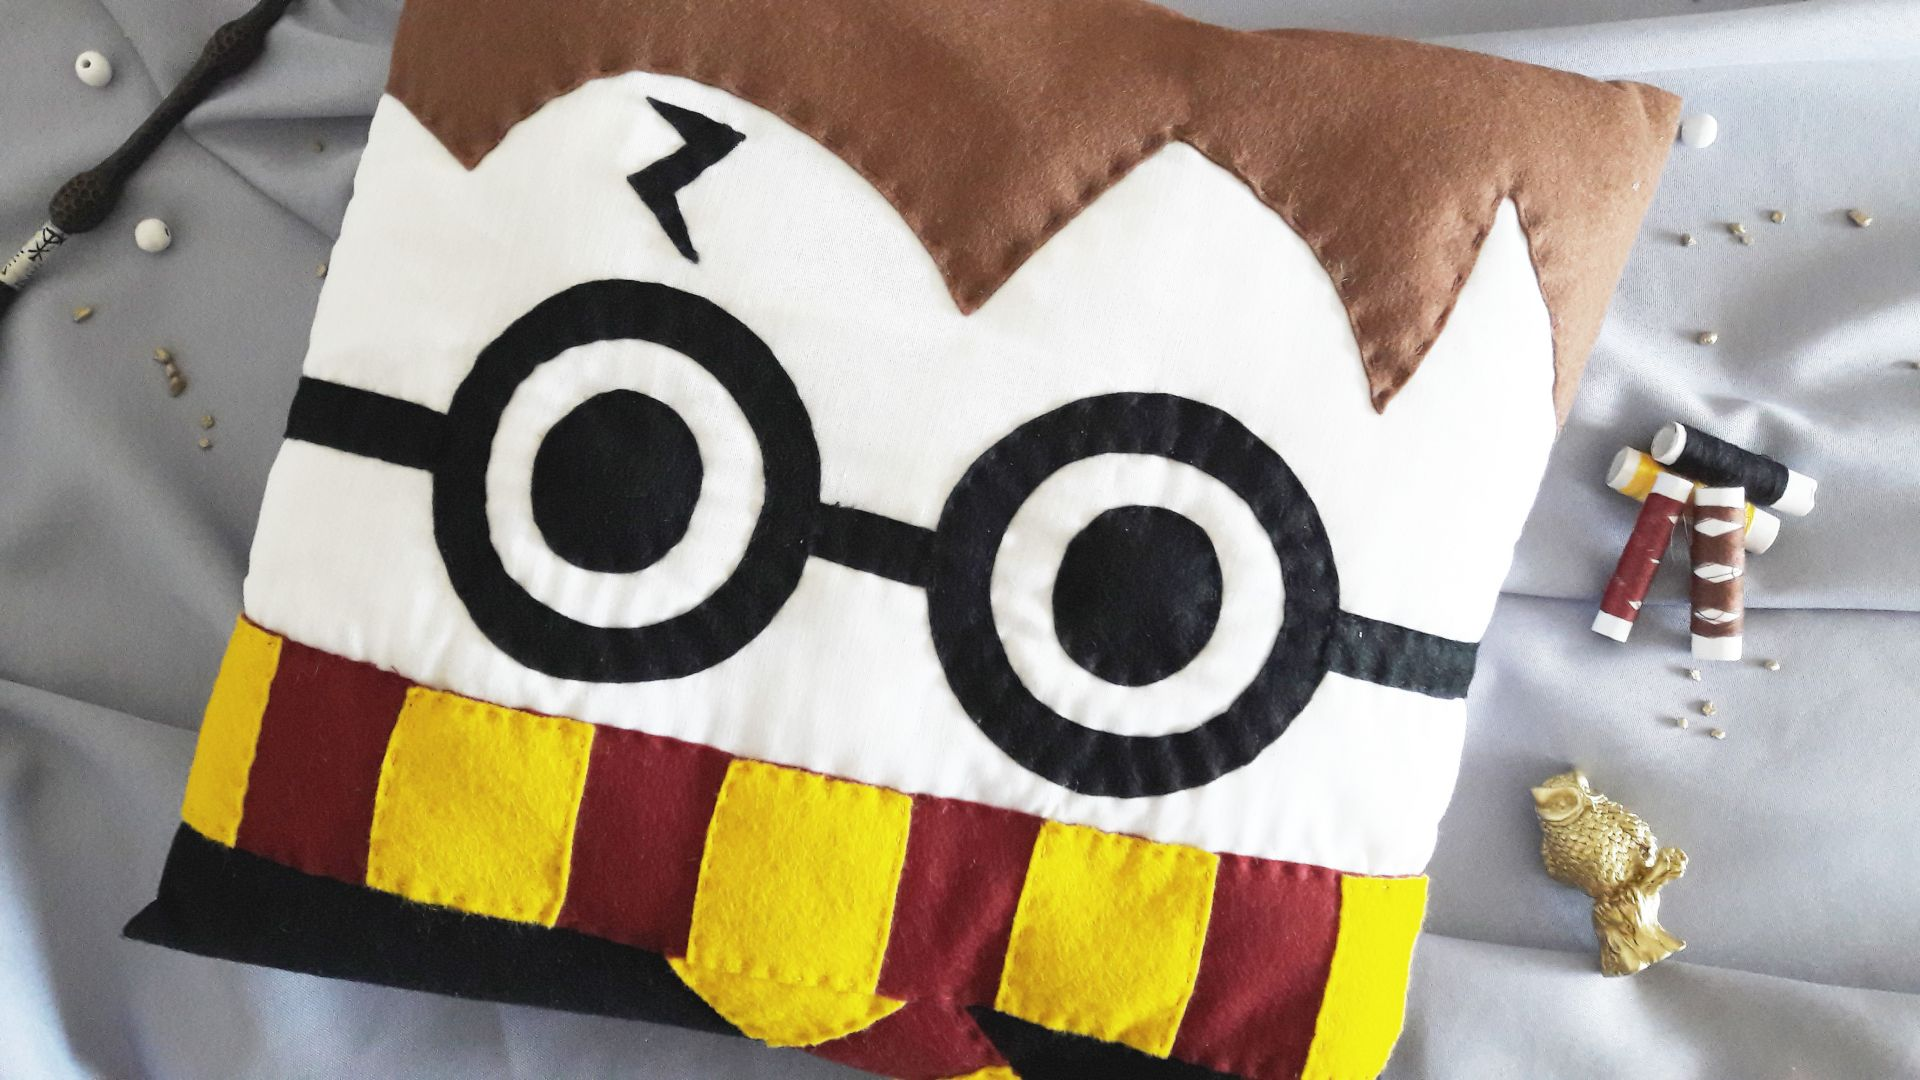 coussin harry potter DIY & Coussin Harry Potter – Loïcia Itréma coussin harry potter